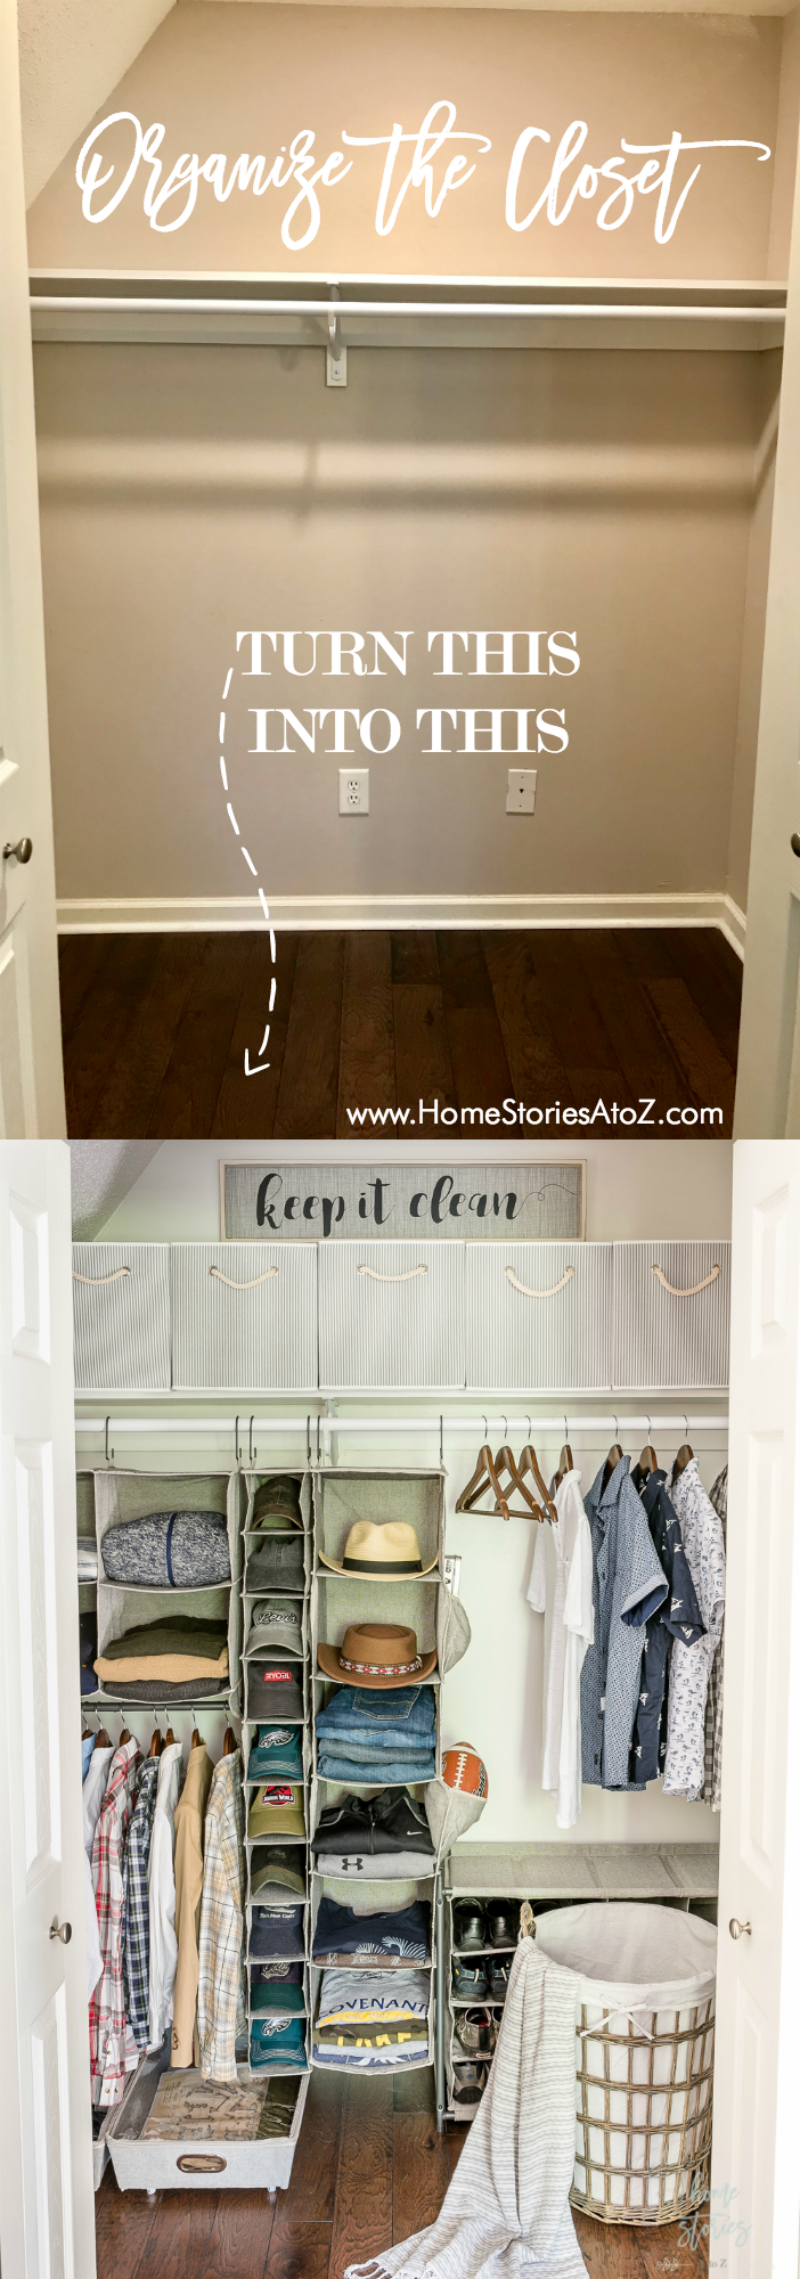 organize the closet